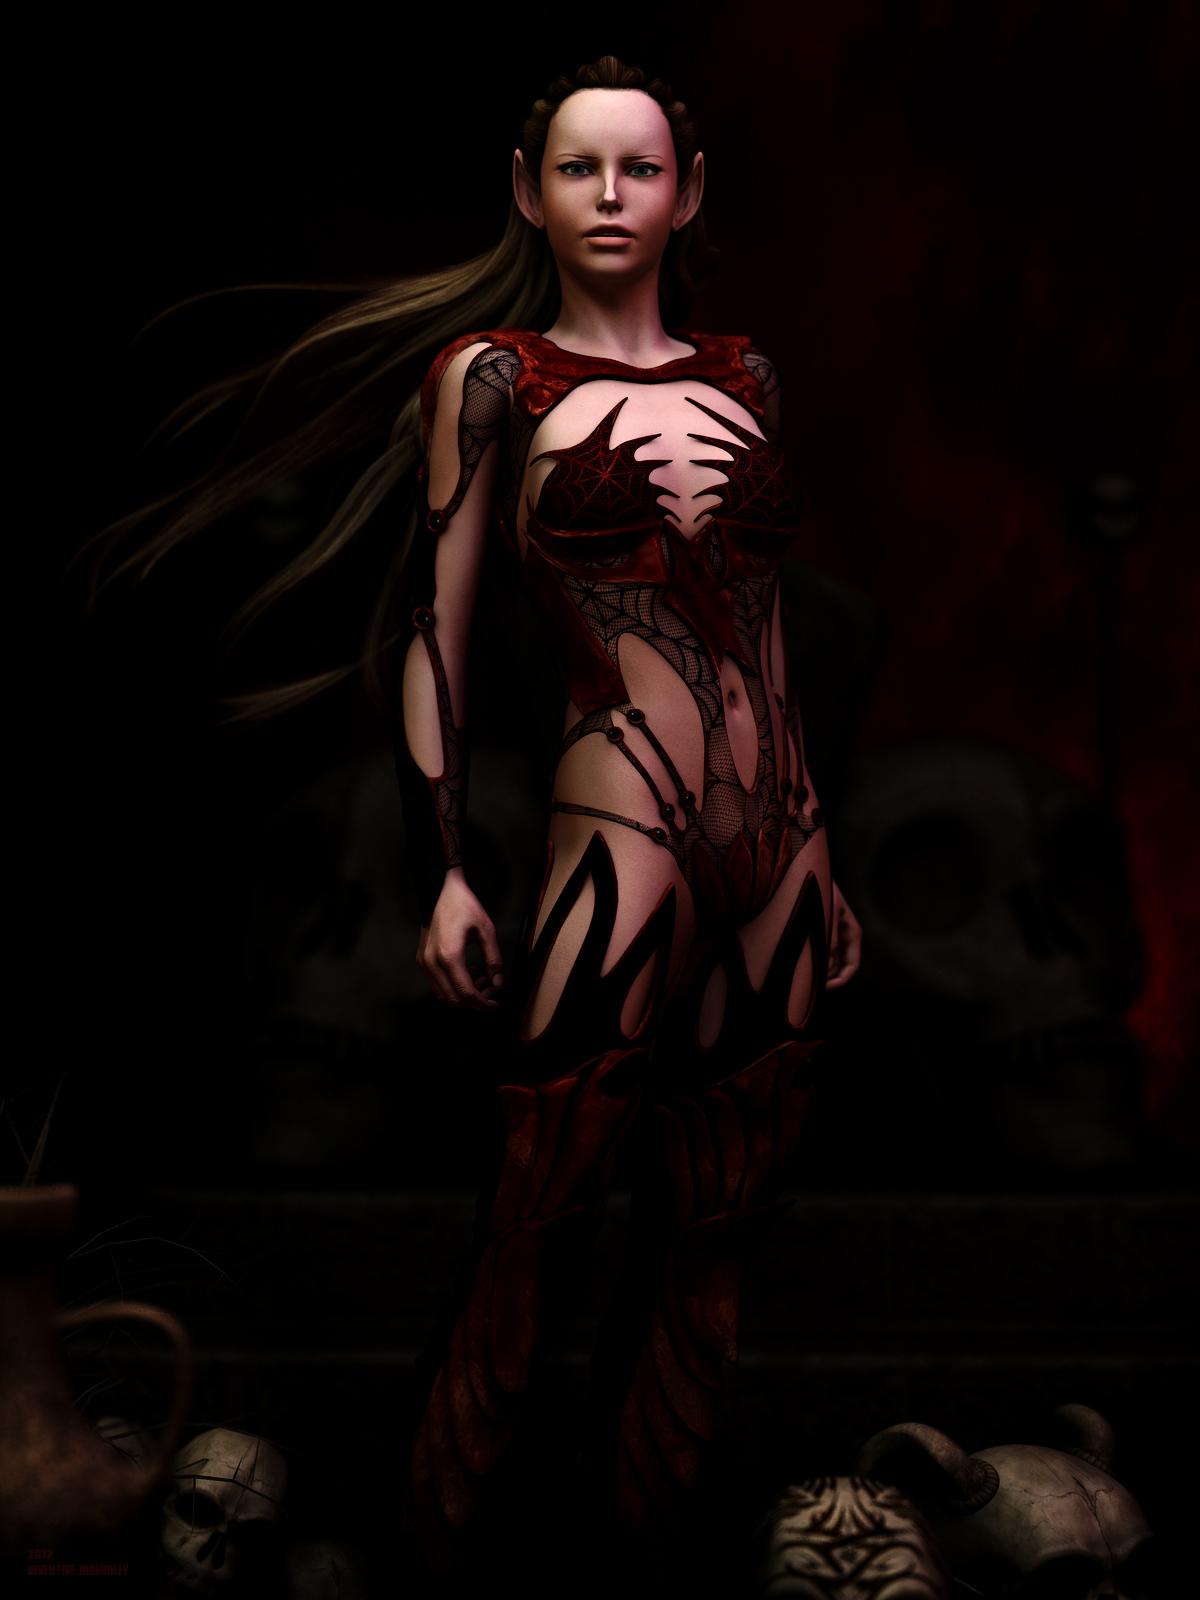 Dark Elf Queen by Virtual-Fox